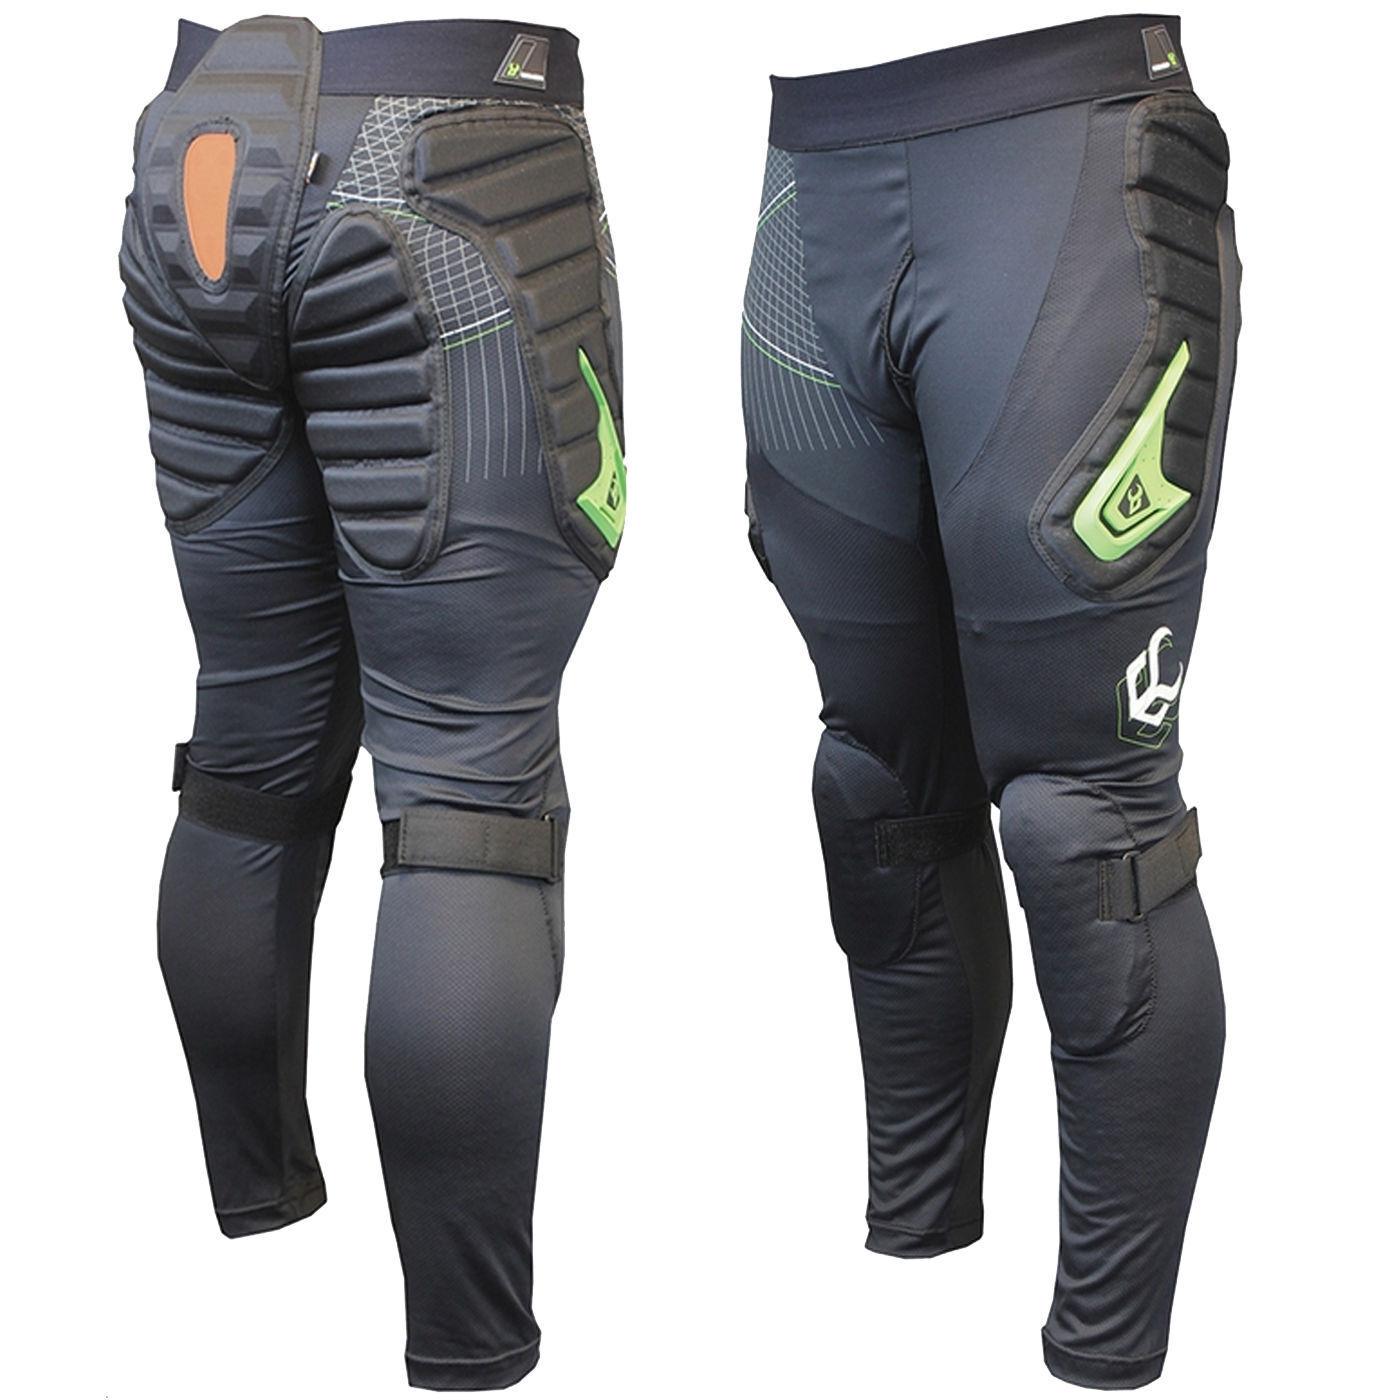 DEMON V2 - X D30 Long Padded Snowboard Pants   Hips, Bum & Knee Pads - DS1491